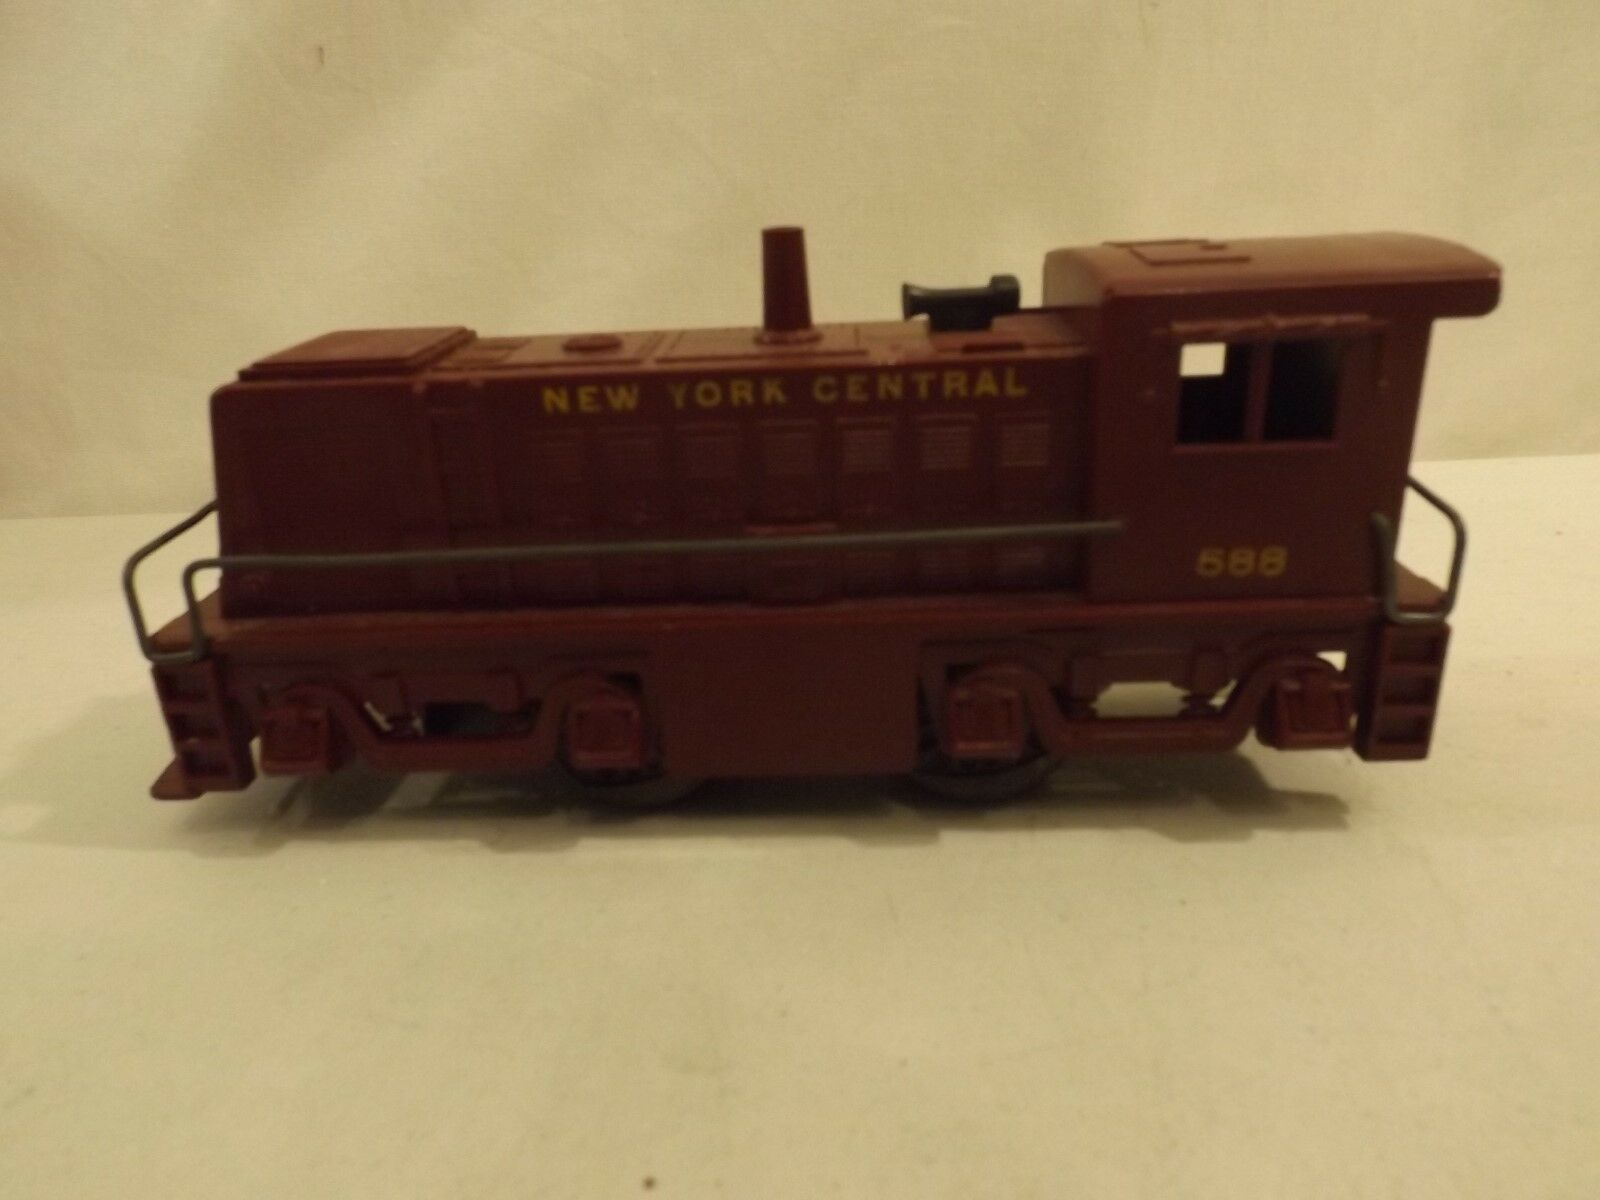 O Marx New York Central diesel engine